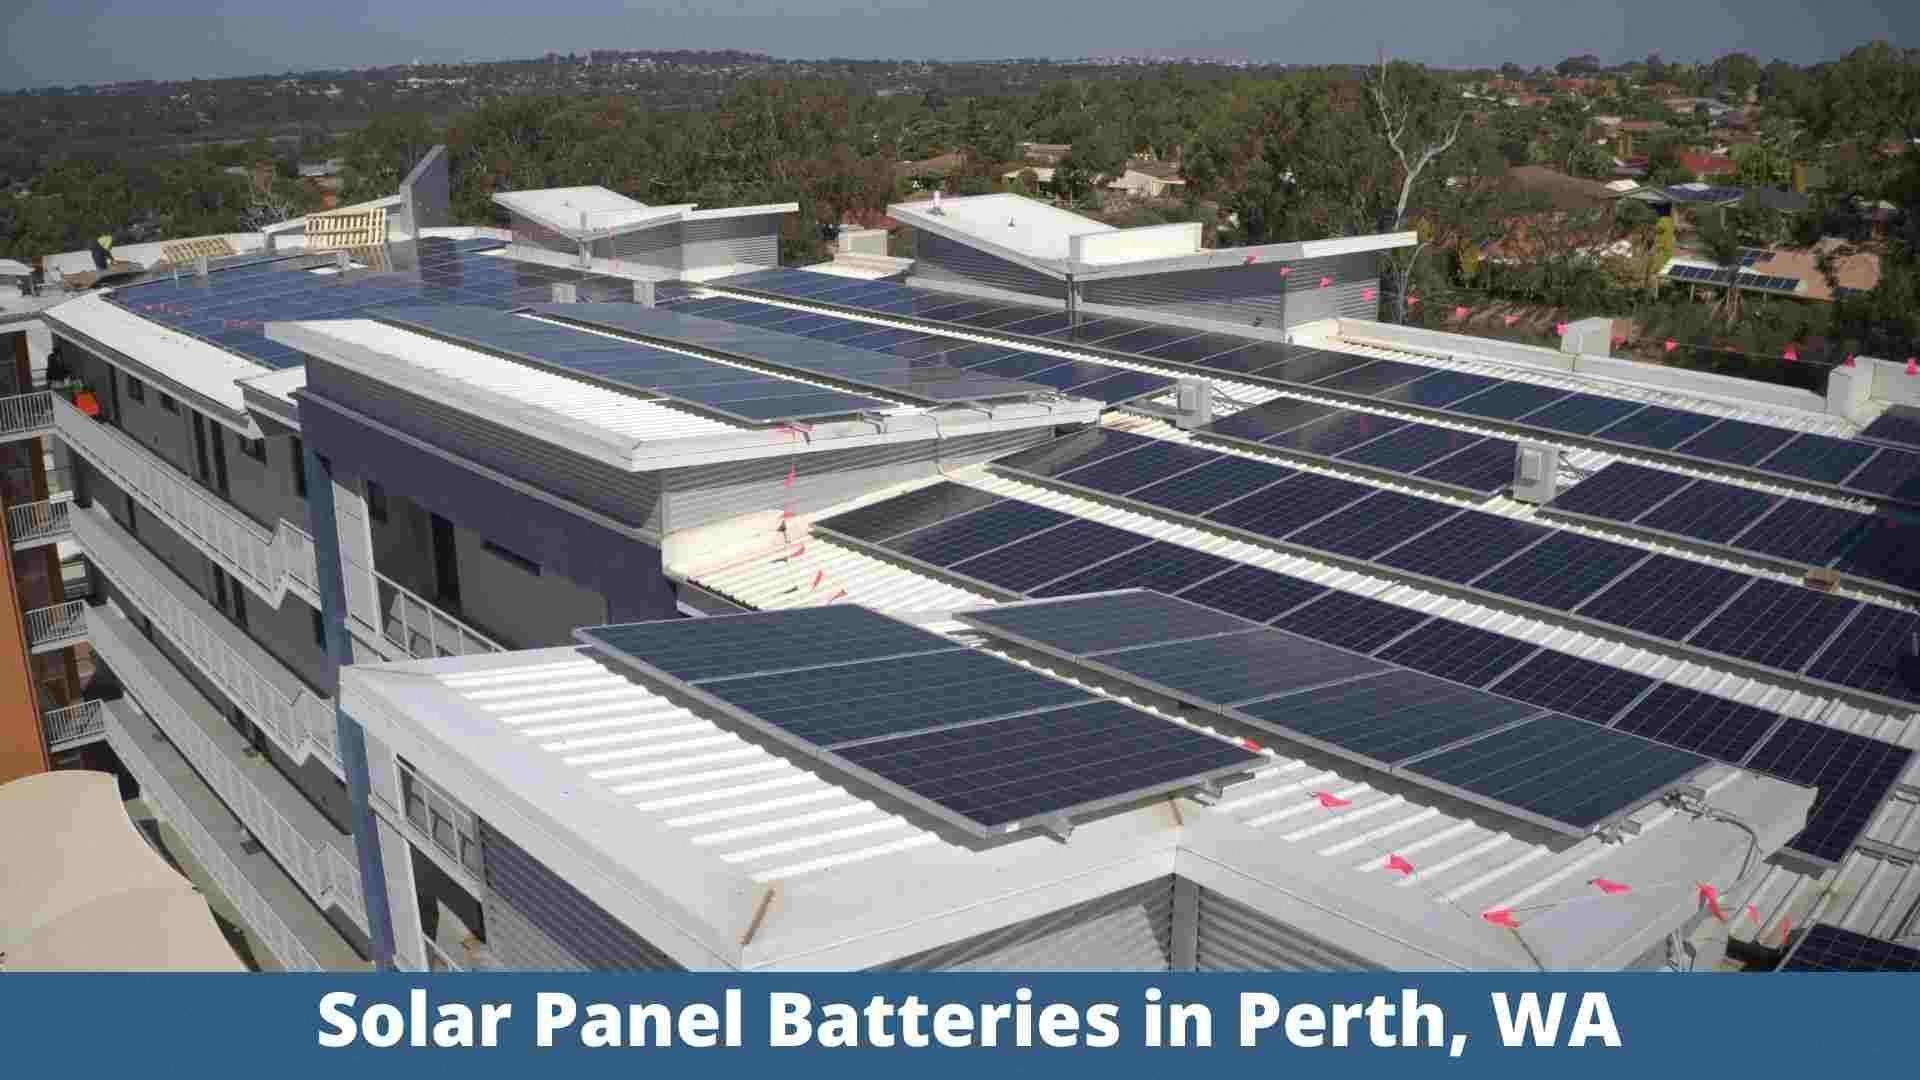 Solar Panel Batteries In Perth Wa In 2020 Residential Solar Panels Solar Pv Systems Solar Power System